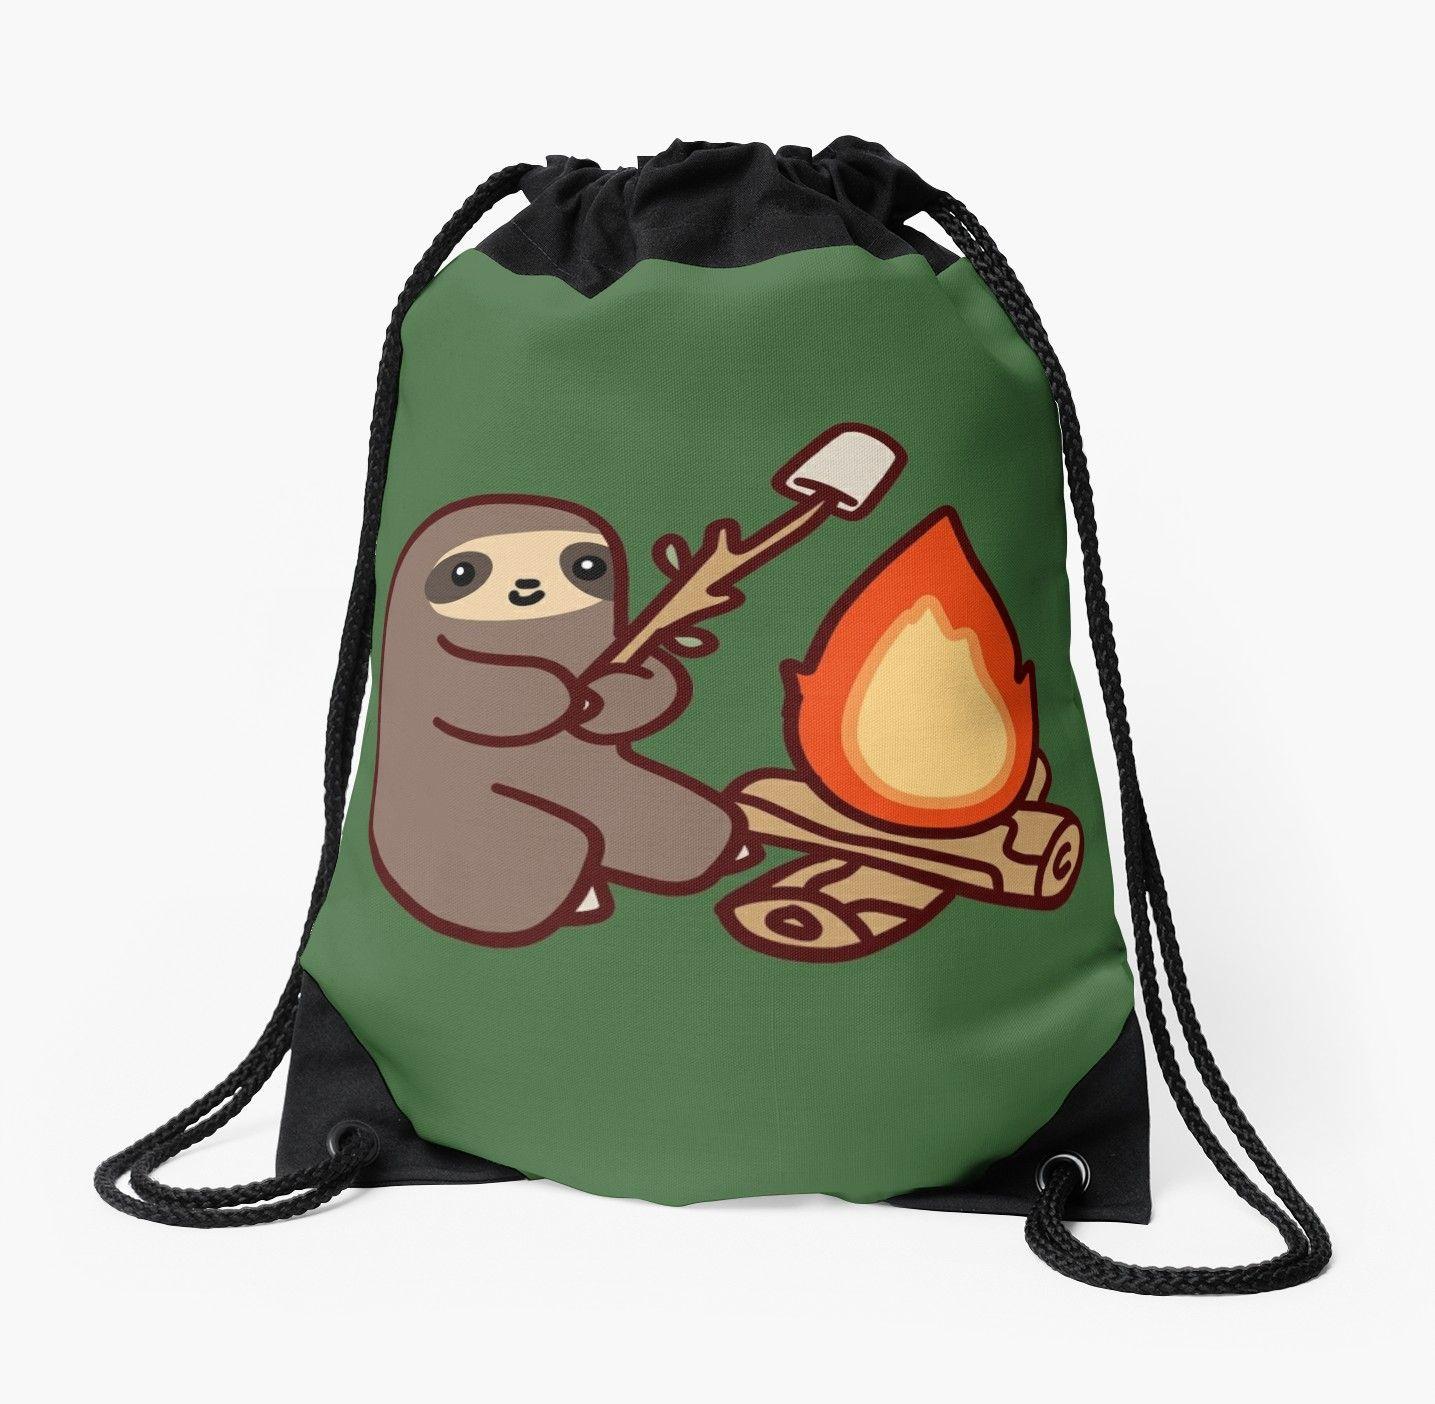 1435x1404 Cute Design Ofndorable, Cartoon Sloth, Roasting